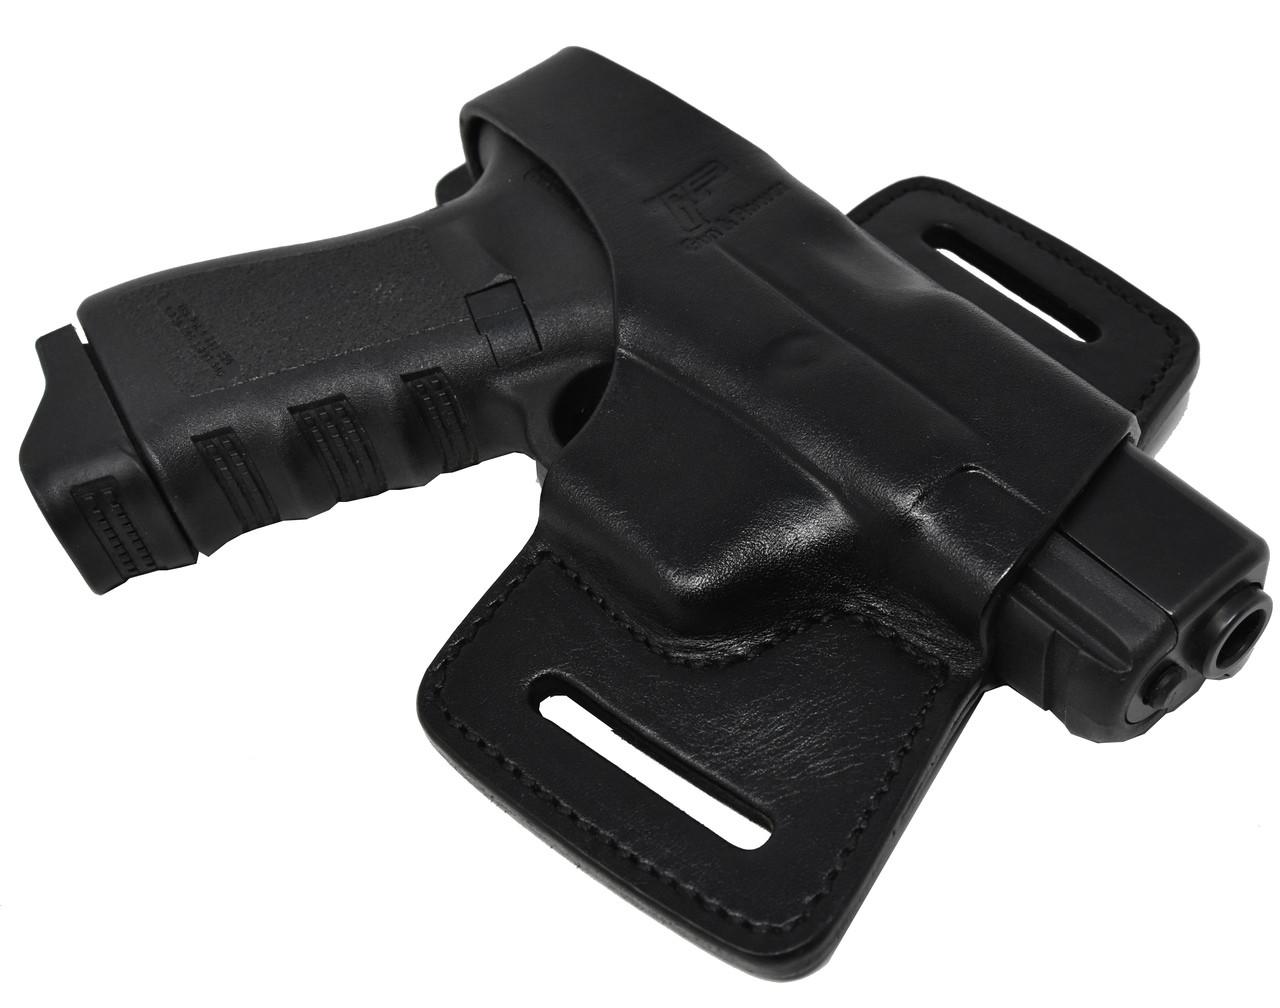 Garrison Grip Black Italian Leather Tactical Holster For All Large GLOCKS Models